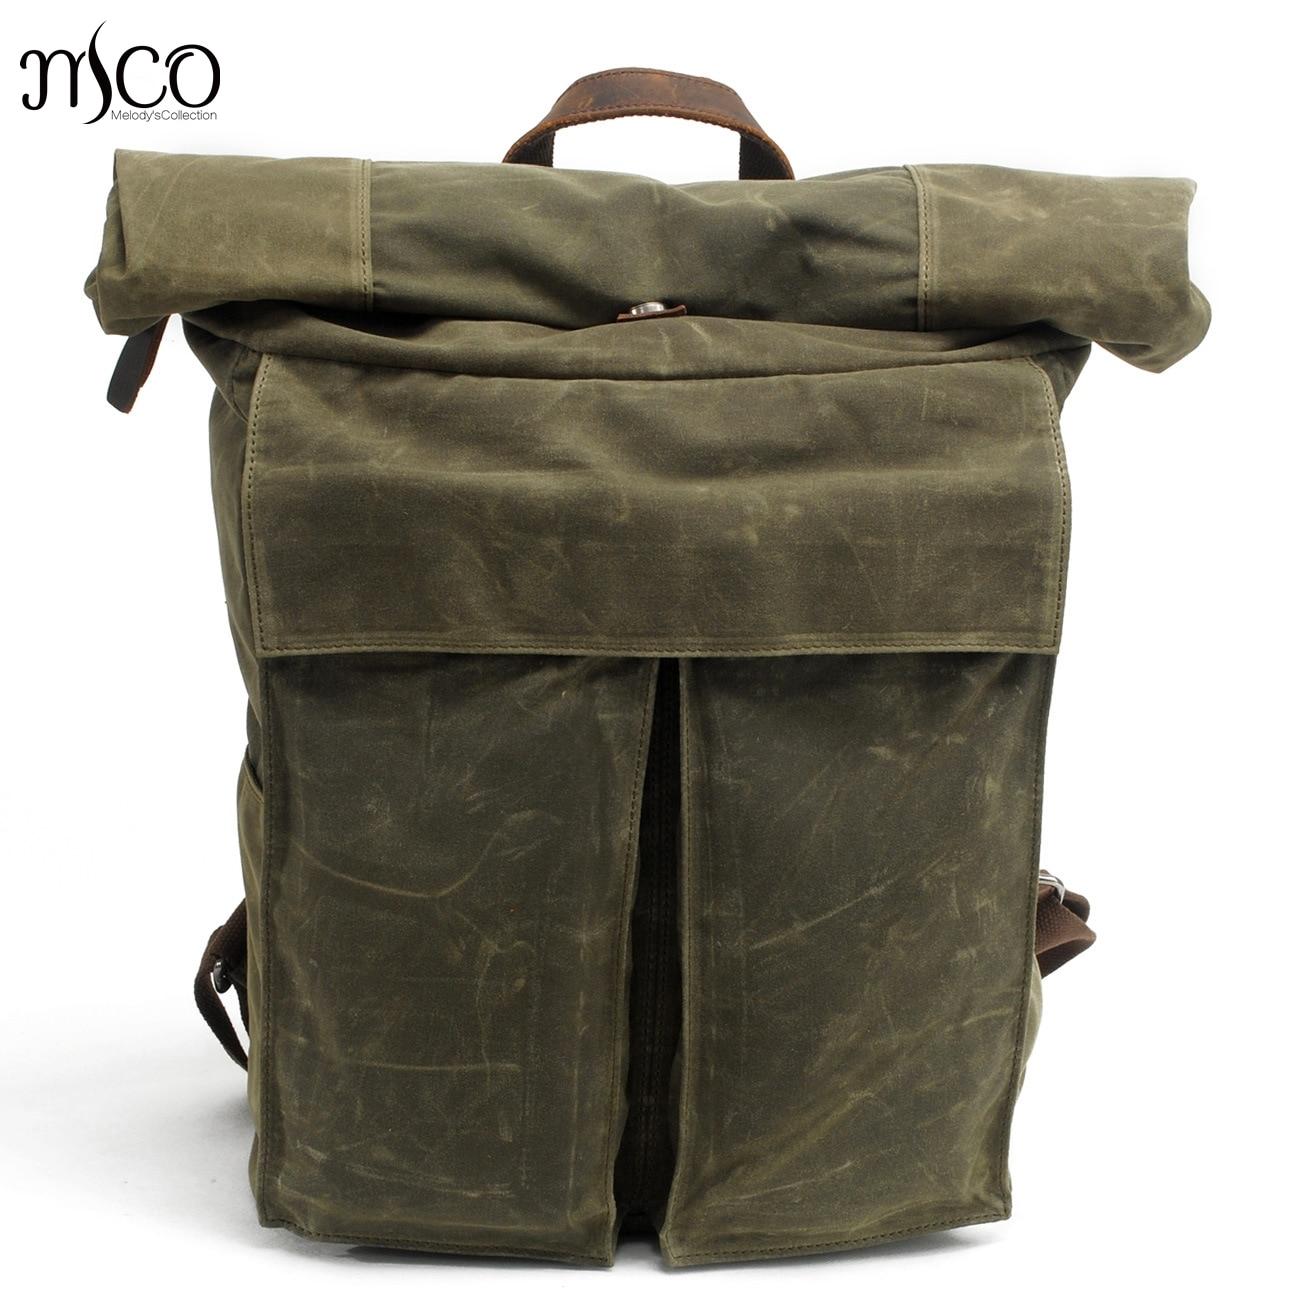 425eedc5bf MCO 2018 Vintage Waterproof Waxed Canvas Men Travel Backpack Large Capacity  Women Weekend Bag Basic Roll Top Military Knapsack-in Backpacks from Luggage  ...